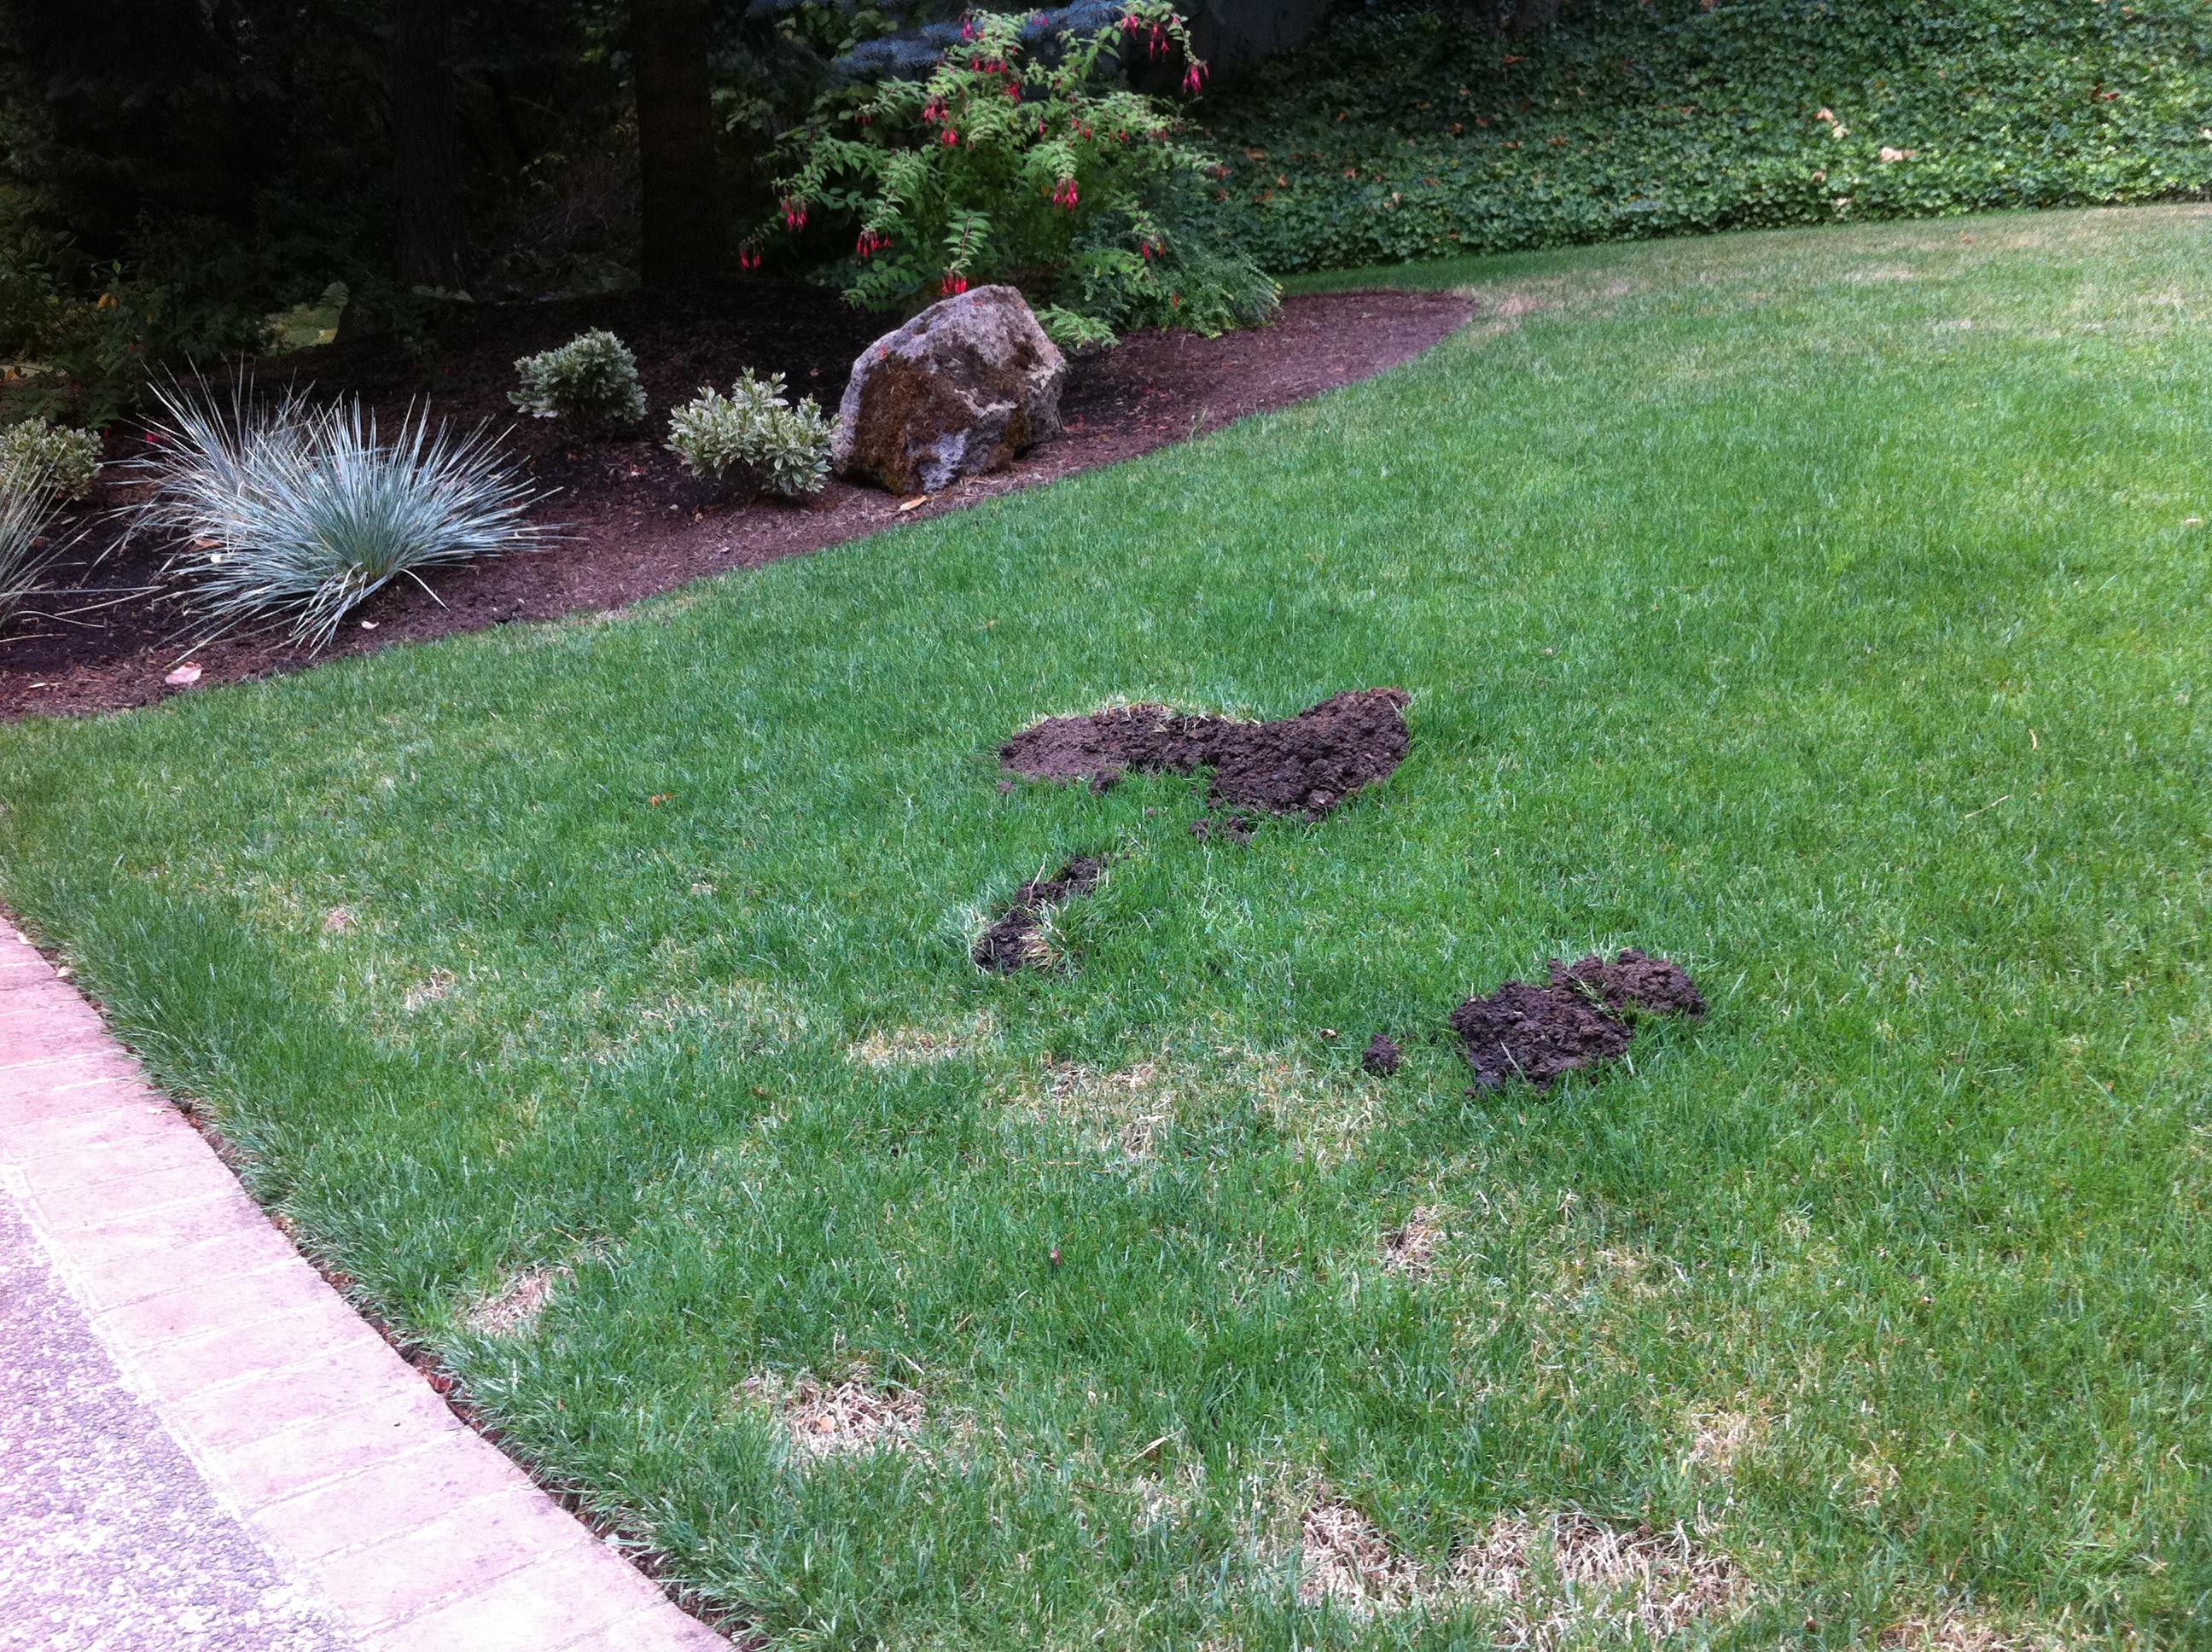 gopher mole mounds